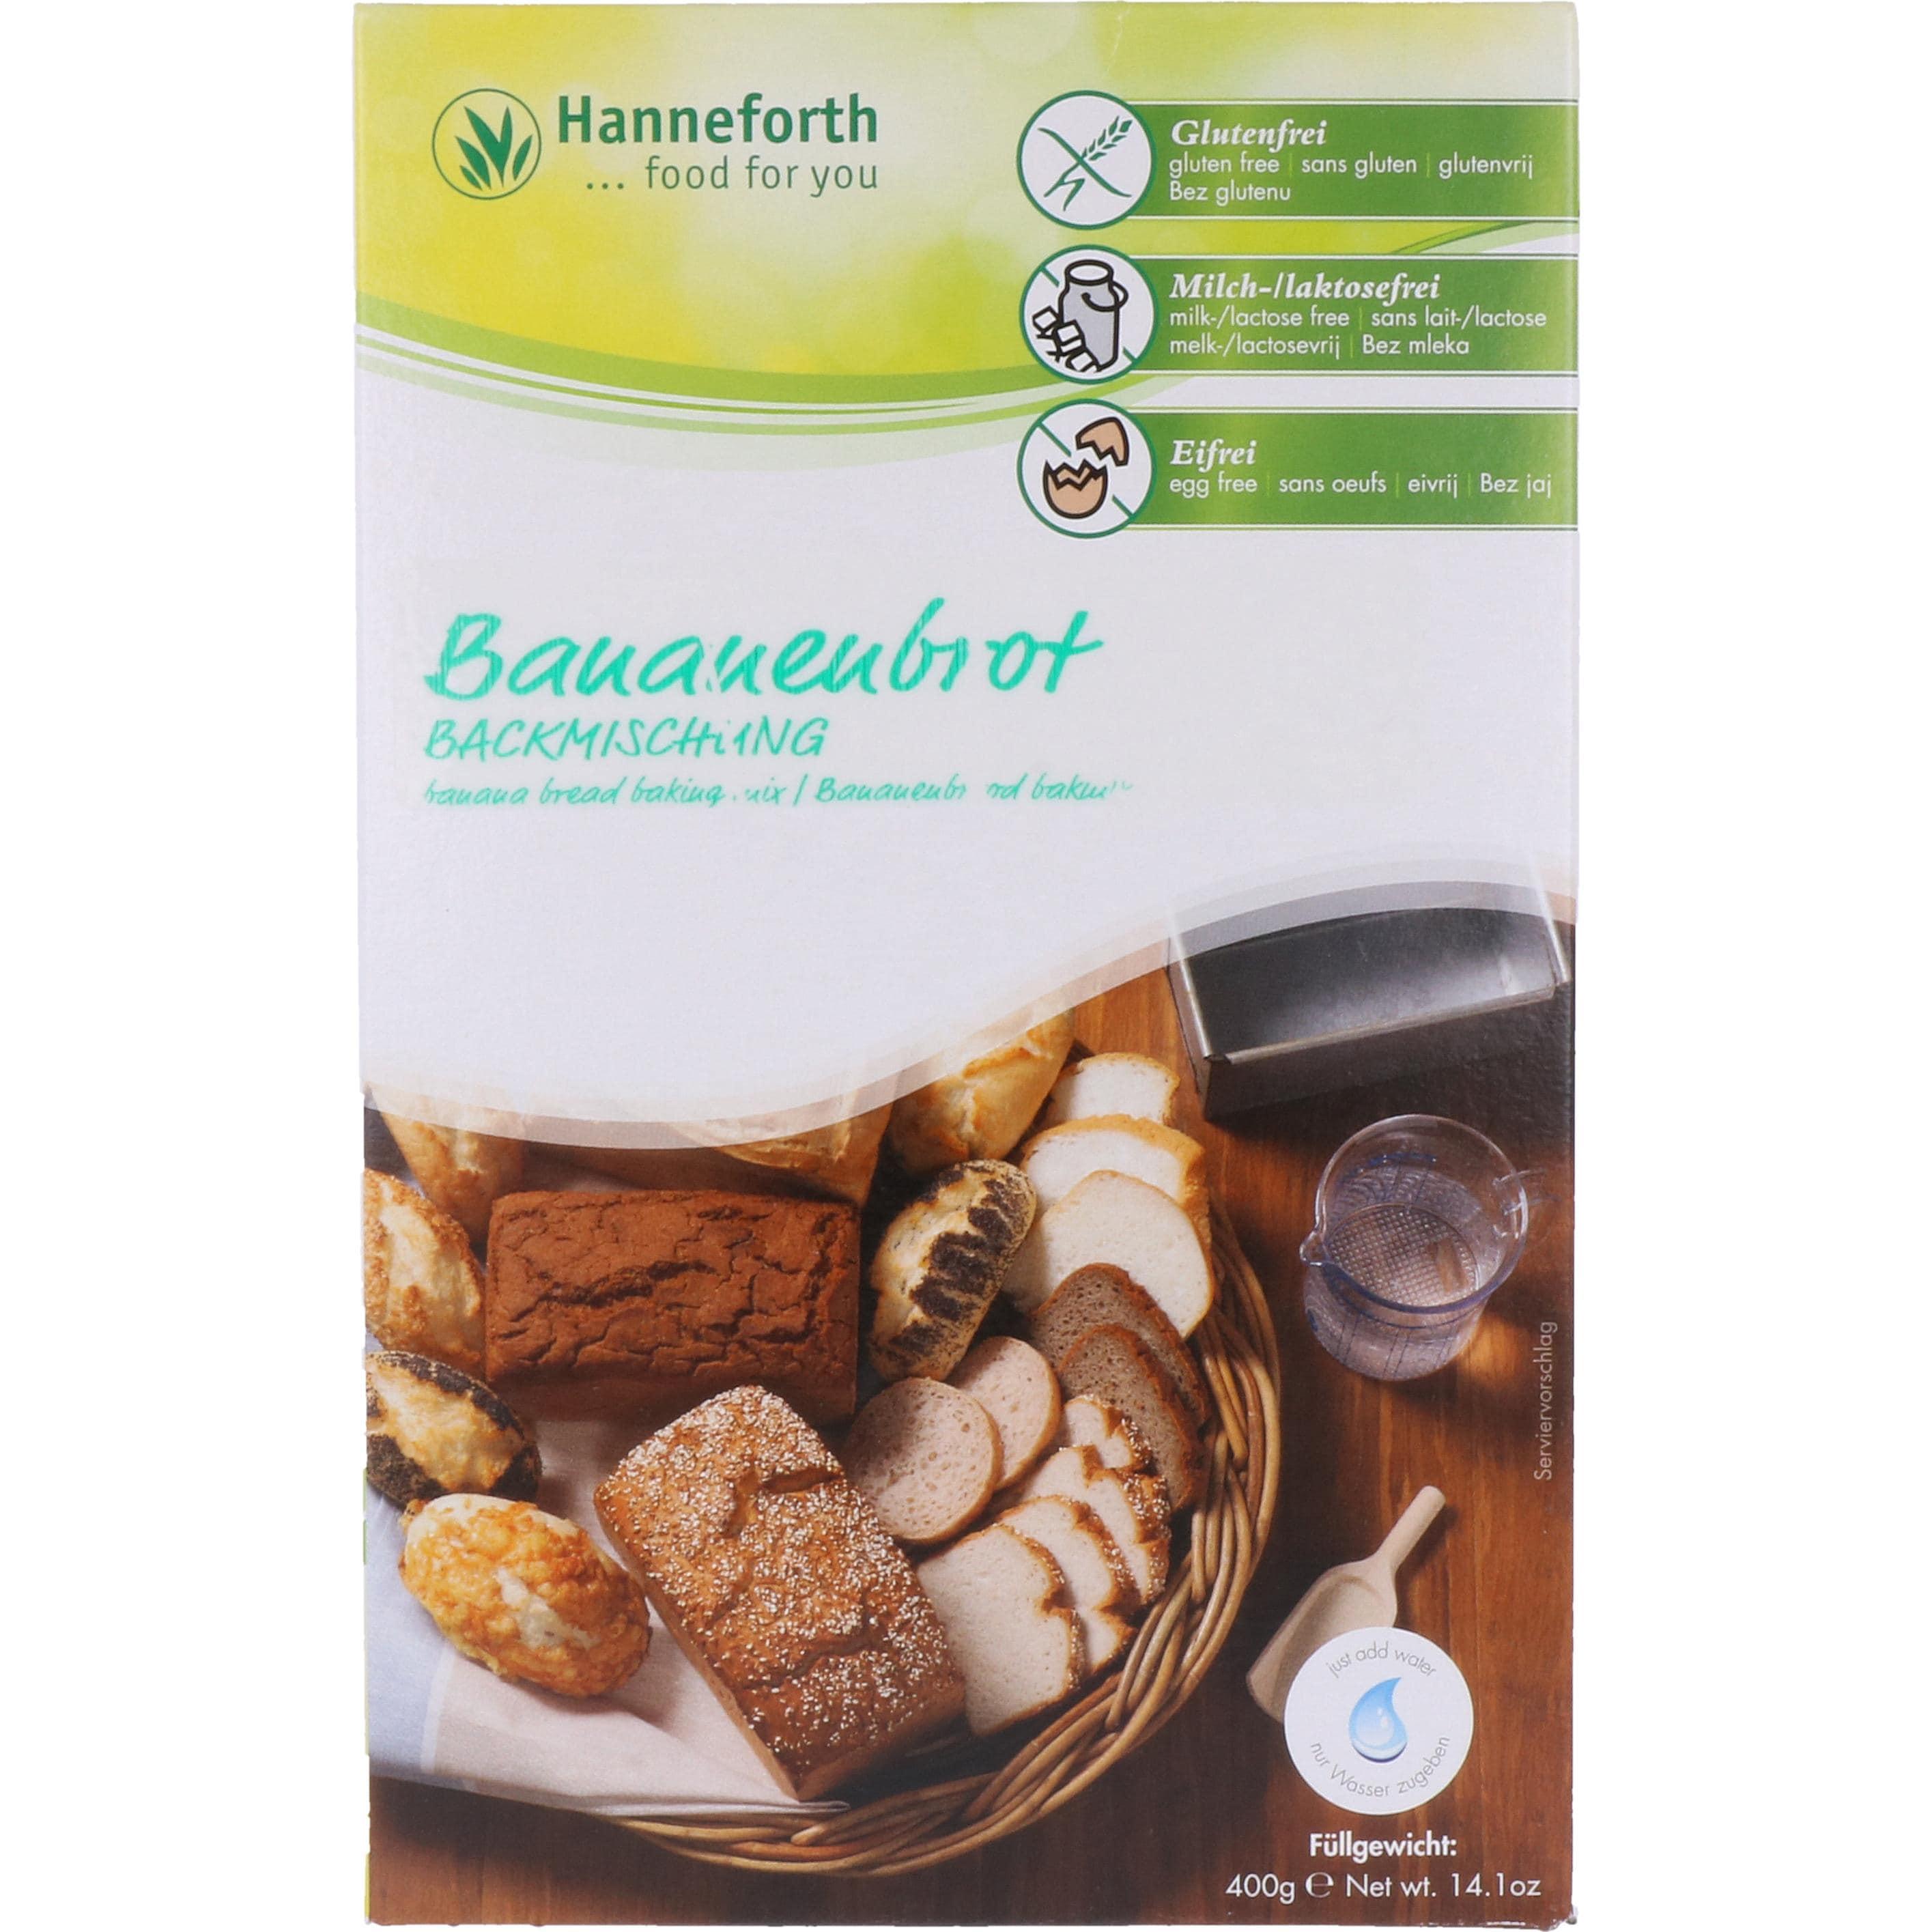 Hanneforth, food for you Backmischung für Bananenbrot 400g